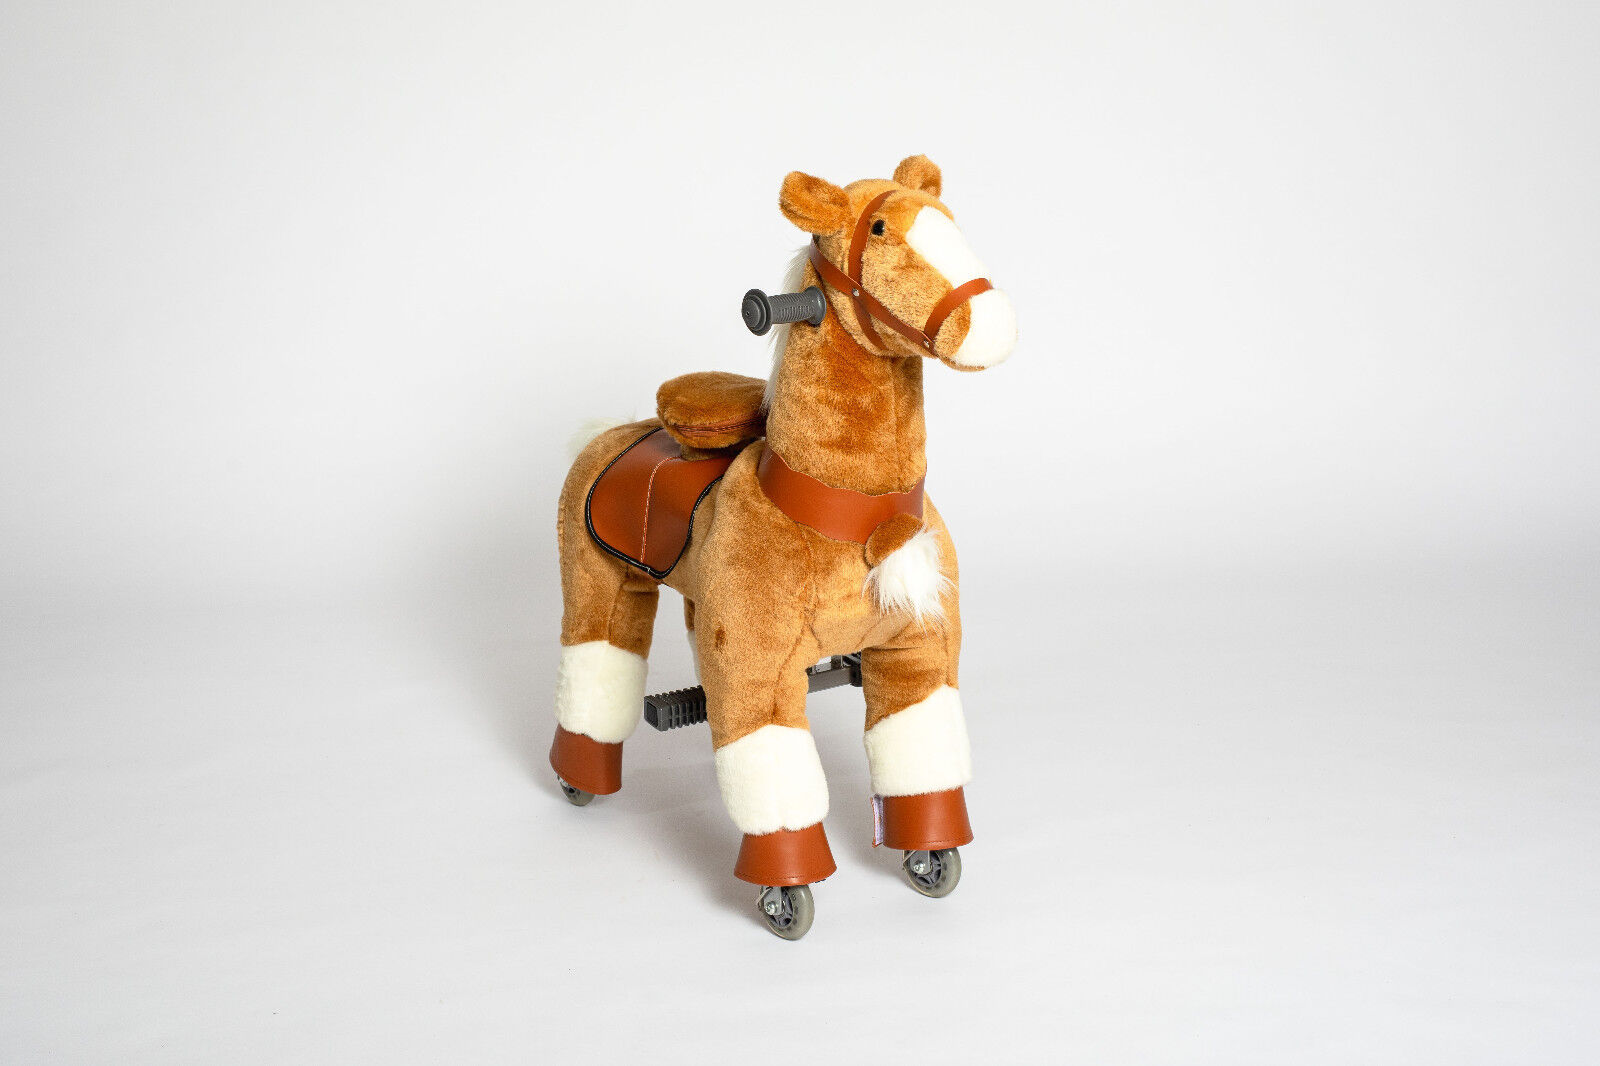 210 cm Tiere lebensgroß Deko Aufblasbarer Elefant XXL Kinder Spielzeug